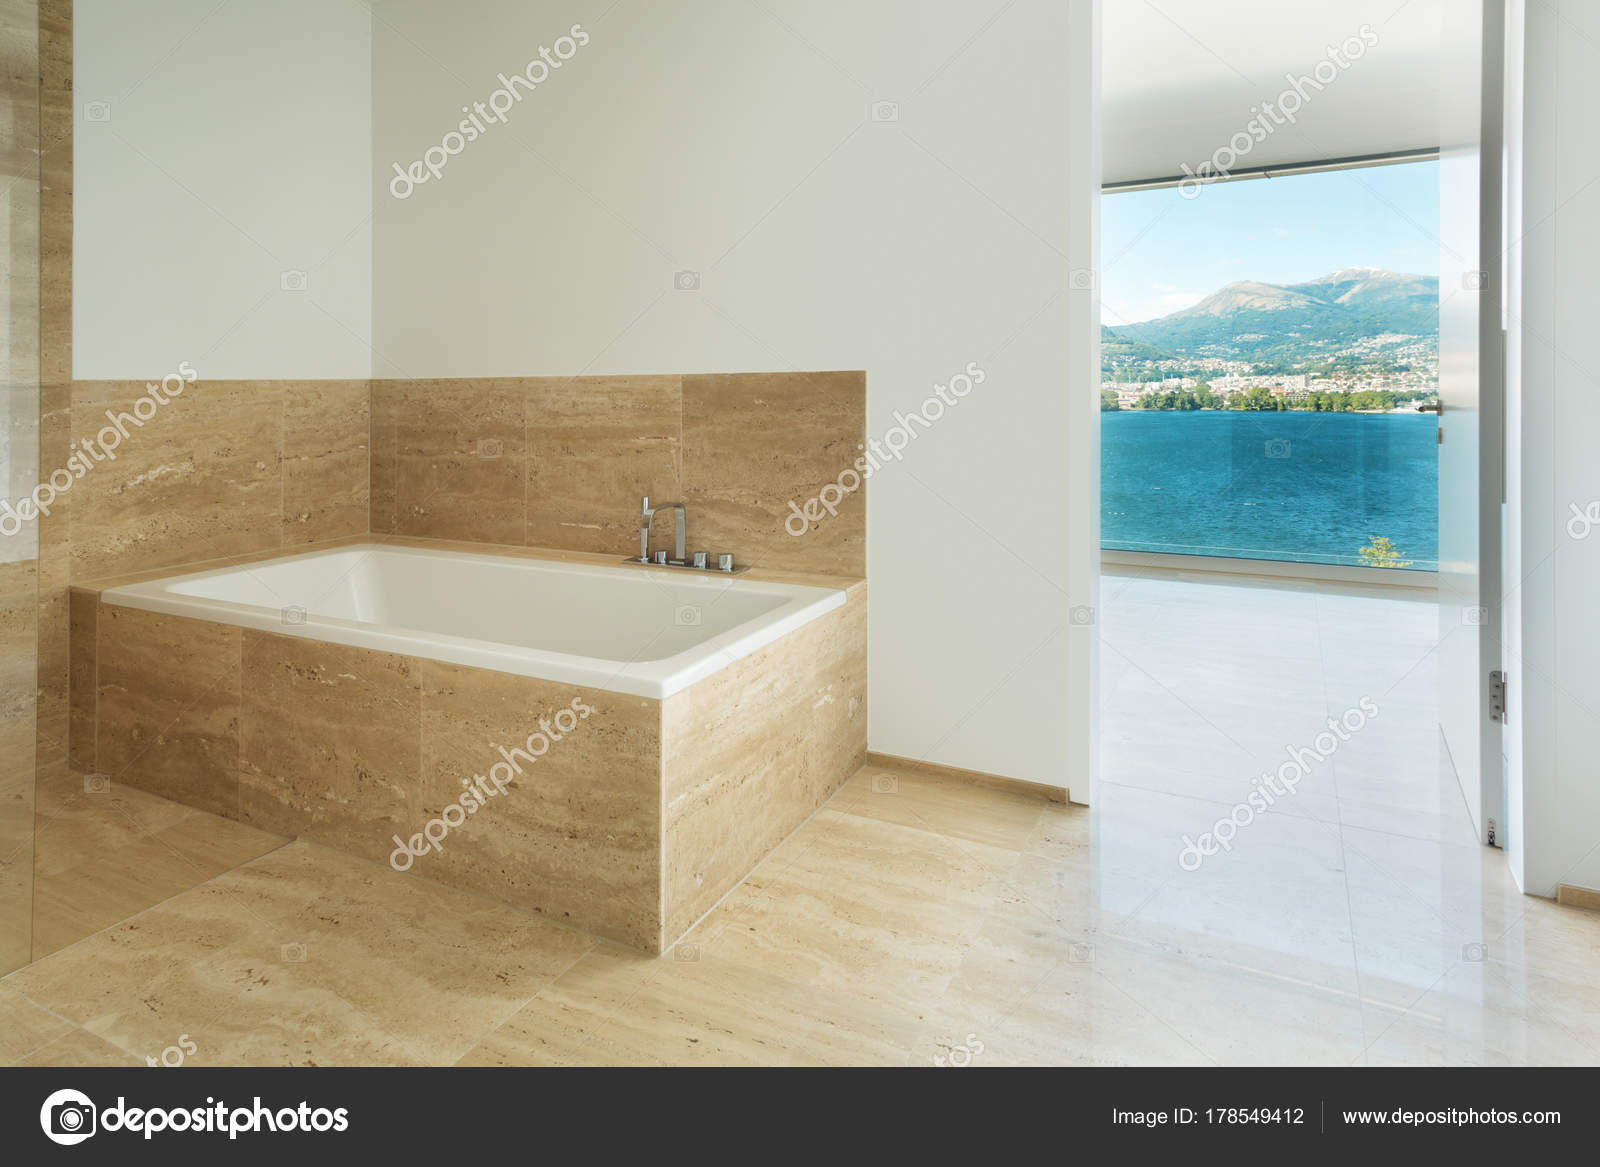 Modelos de marmol travertino | Cuarto de baño, suelo de mármol ...